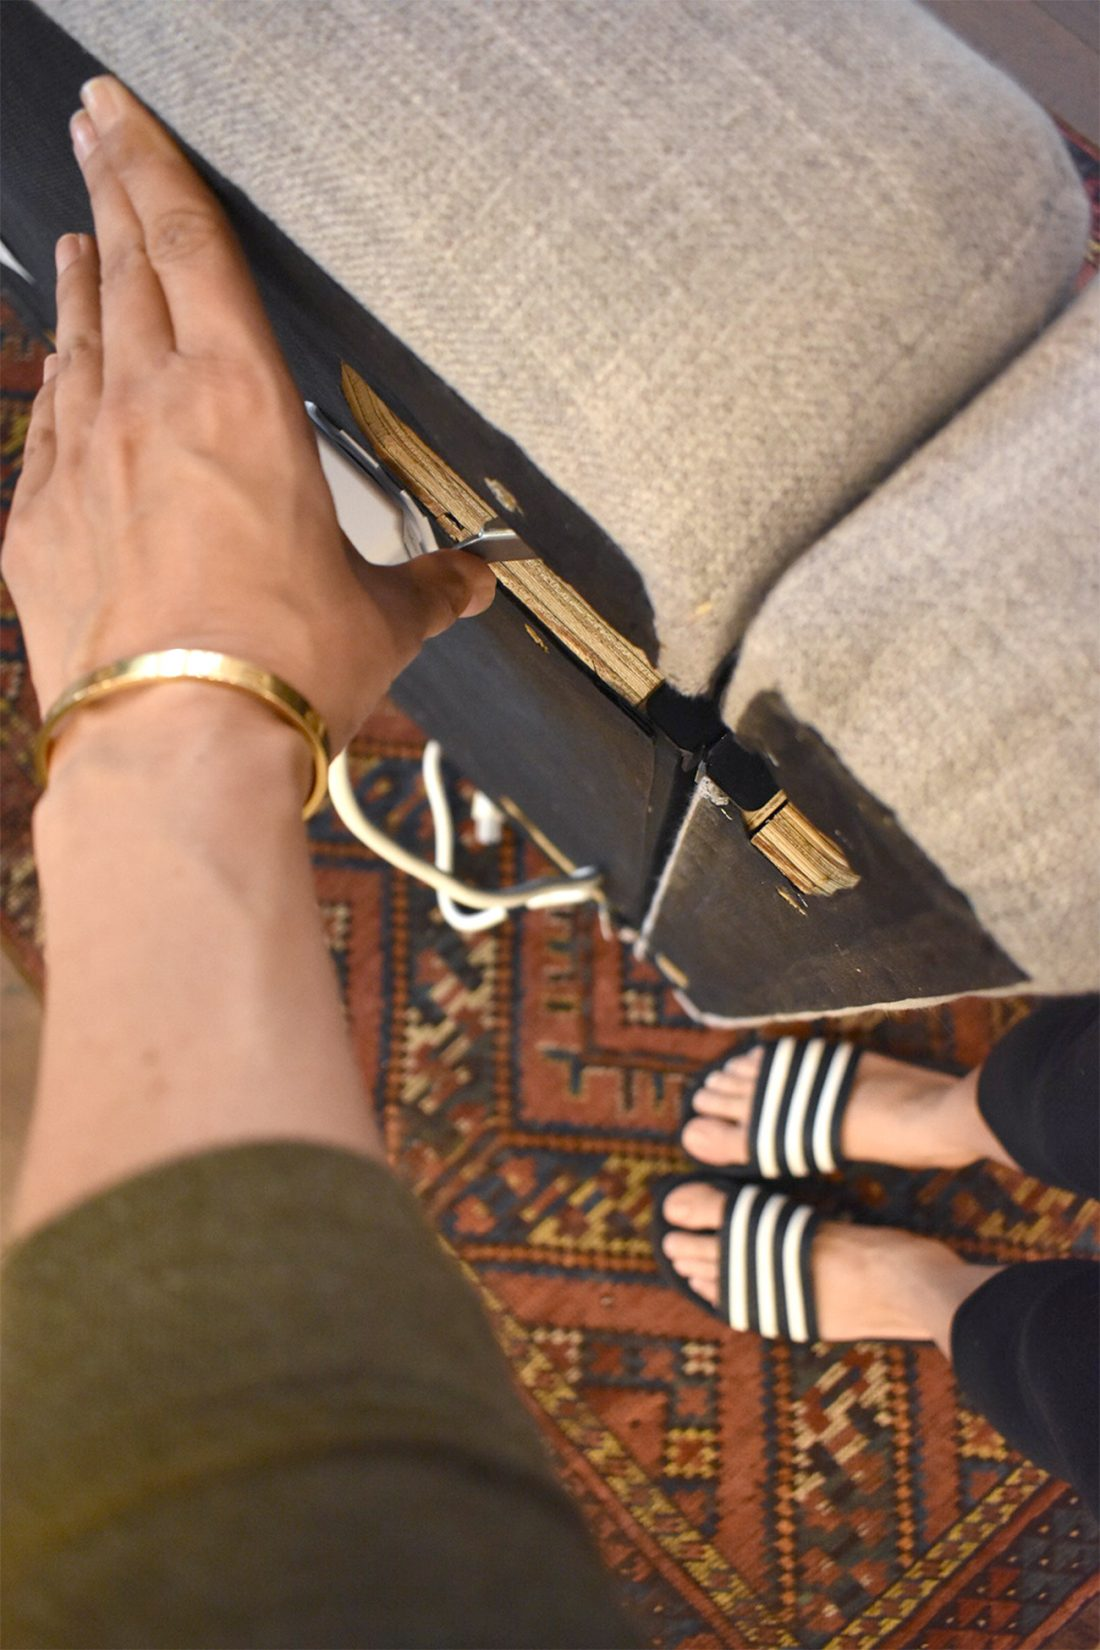 Burrow Sofa: Putting it together